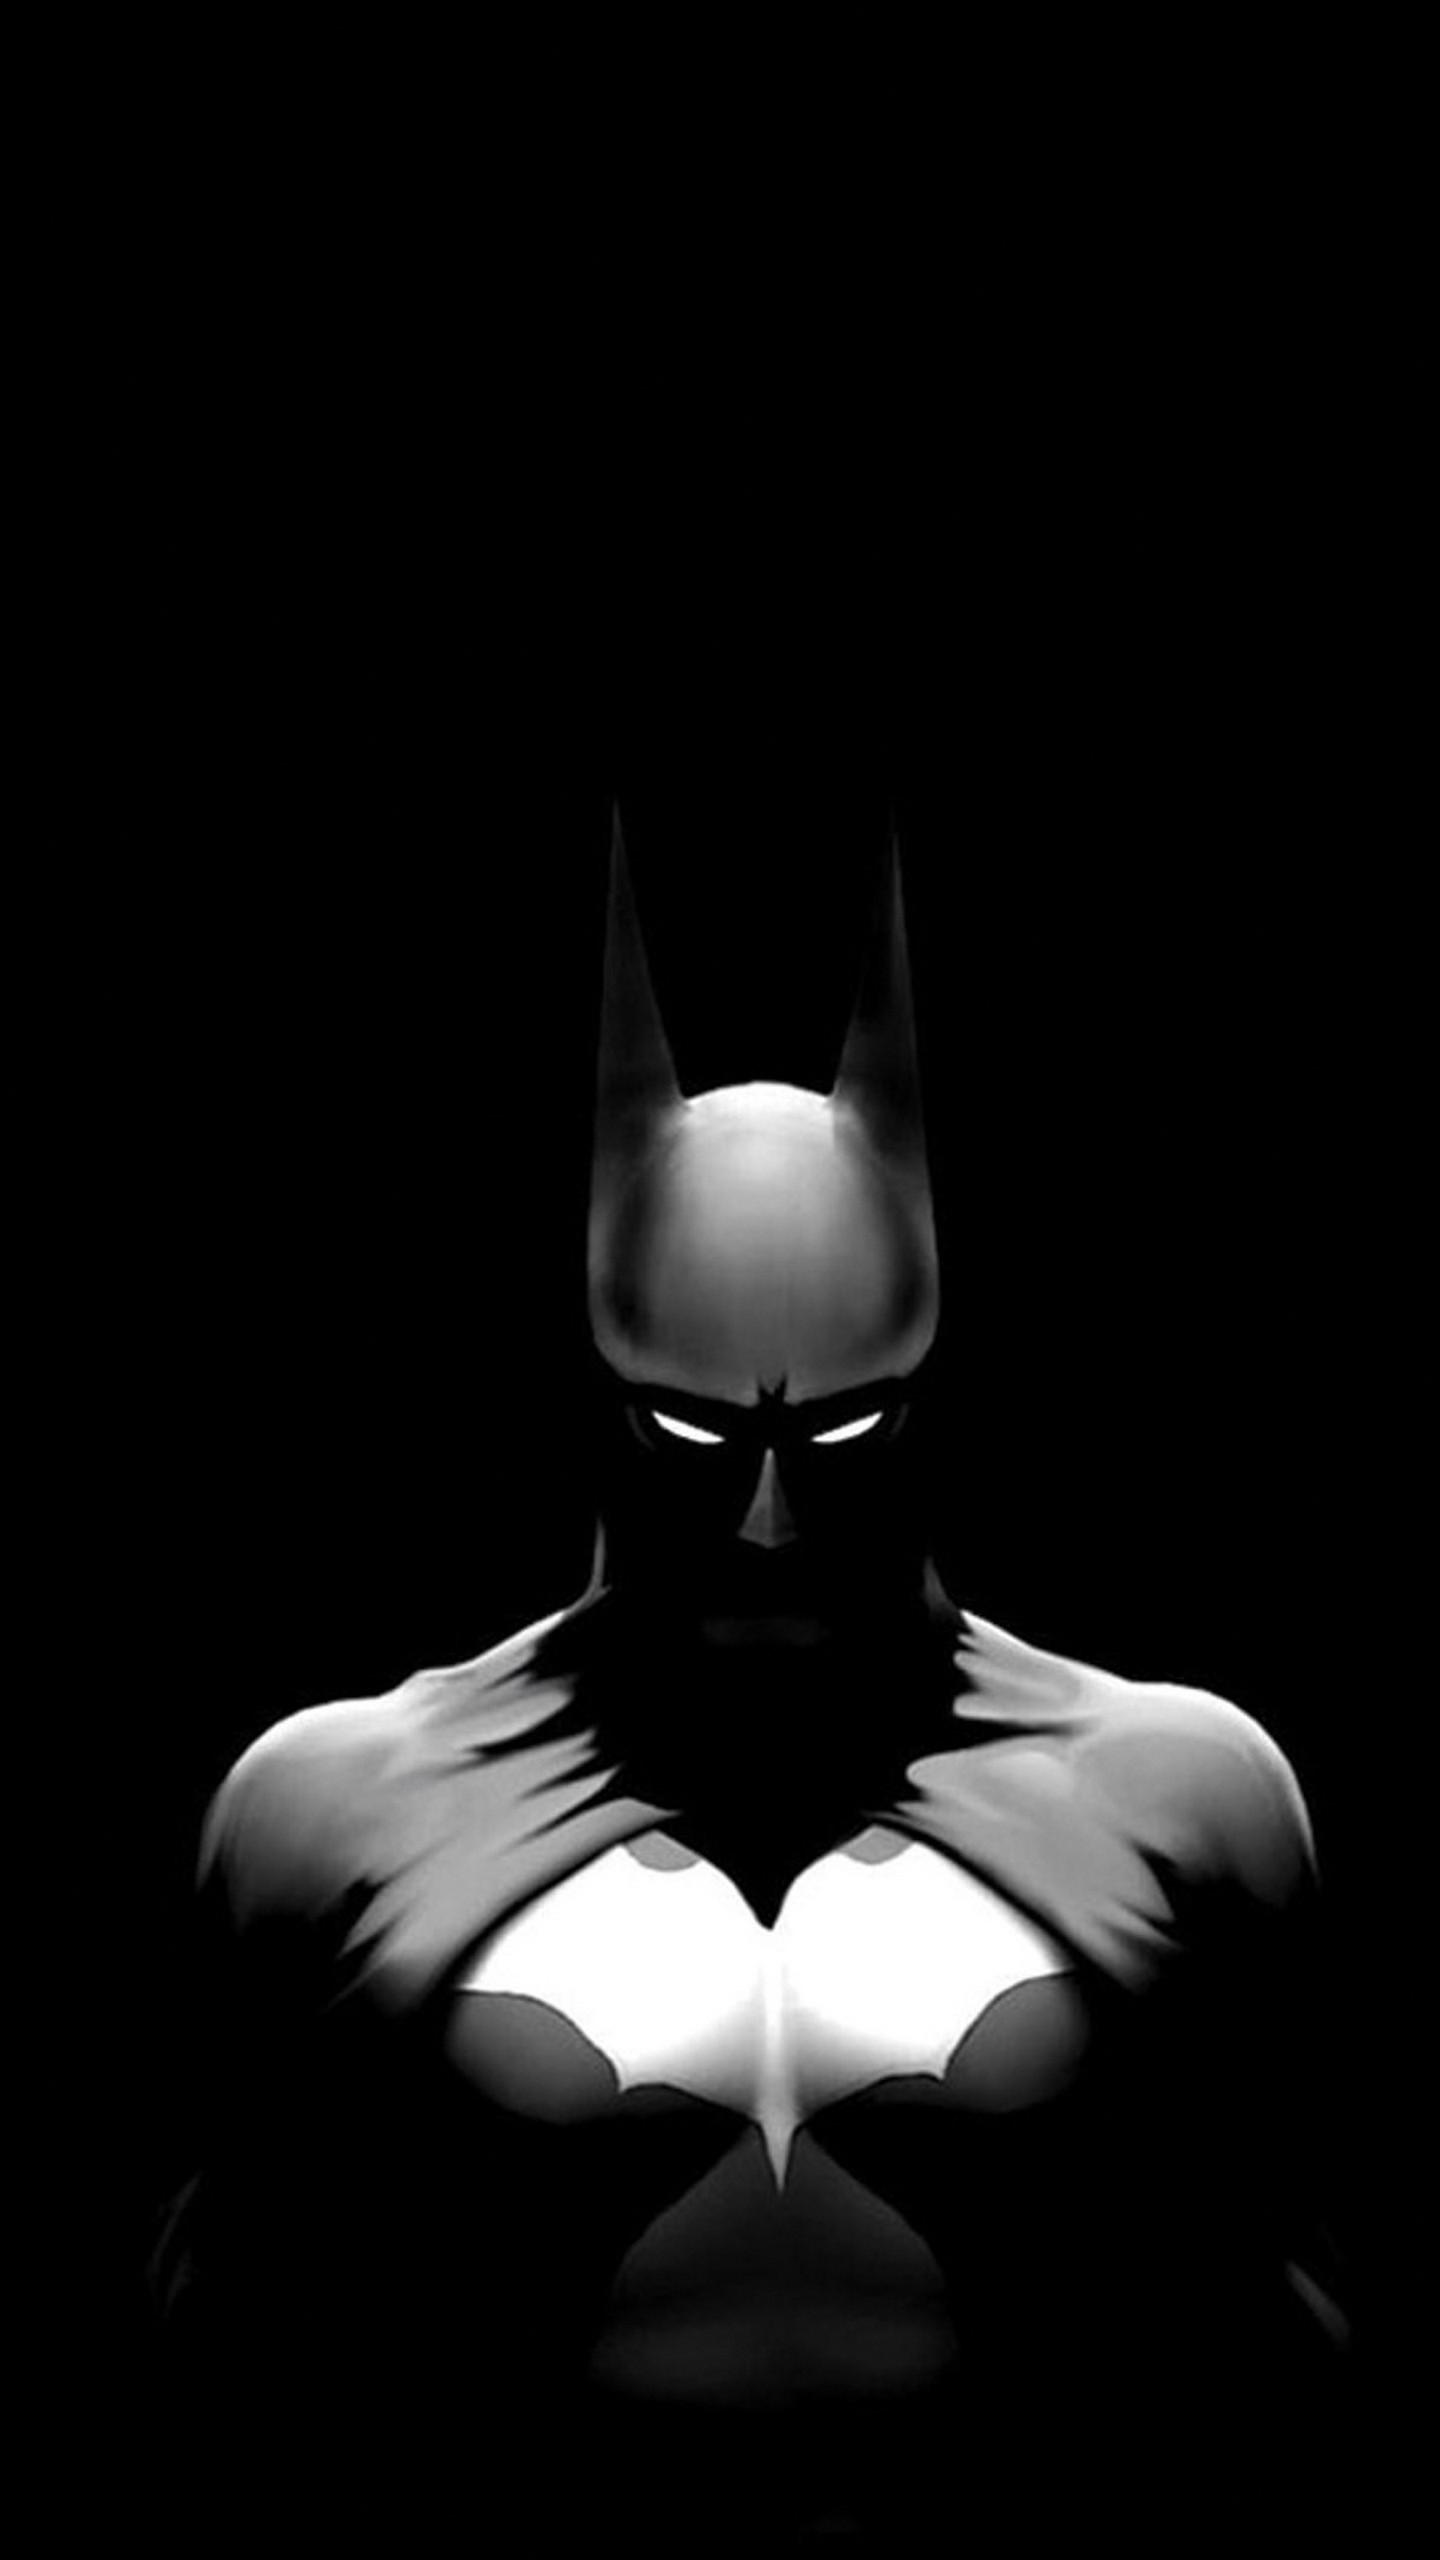 Batman Dark Lock Screen 1440×2560 Samsung Galaxy Note 4 Wallpaper .